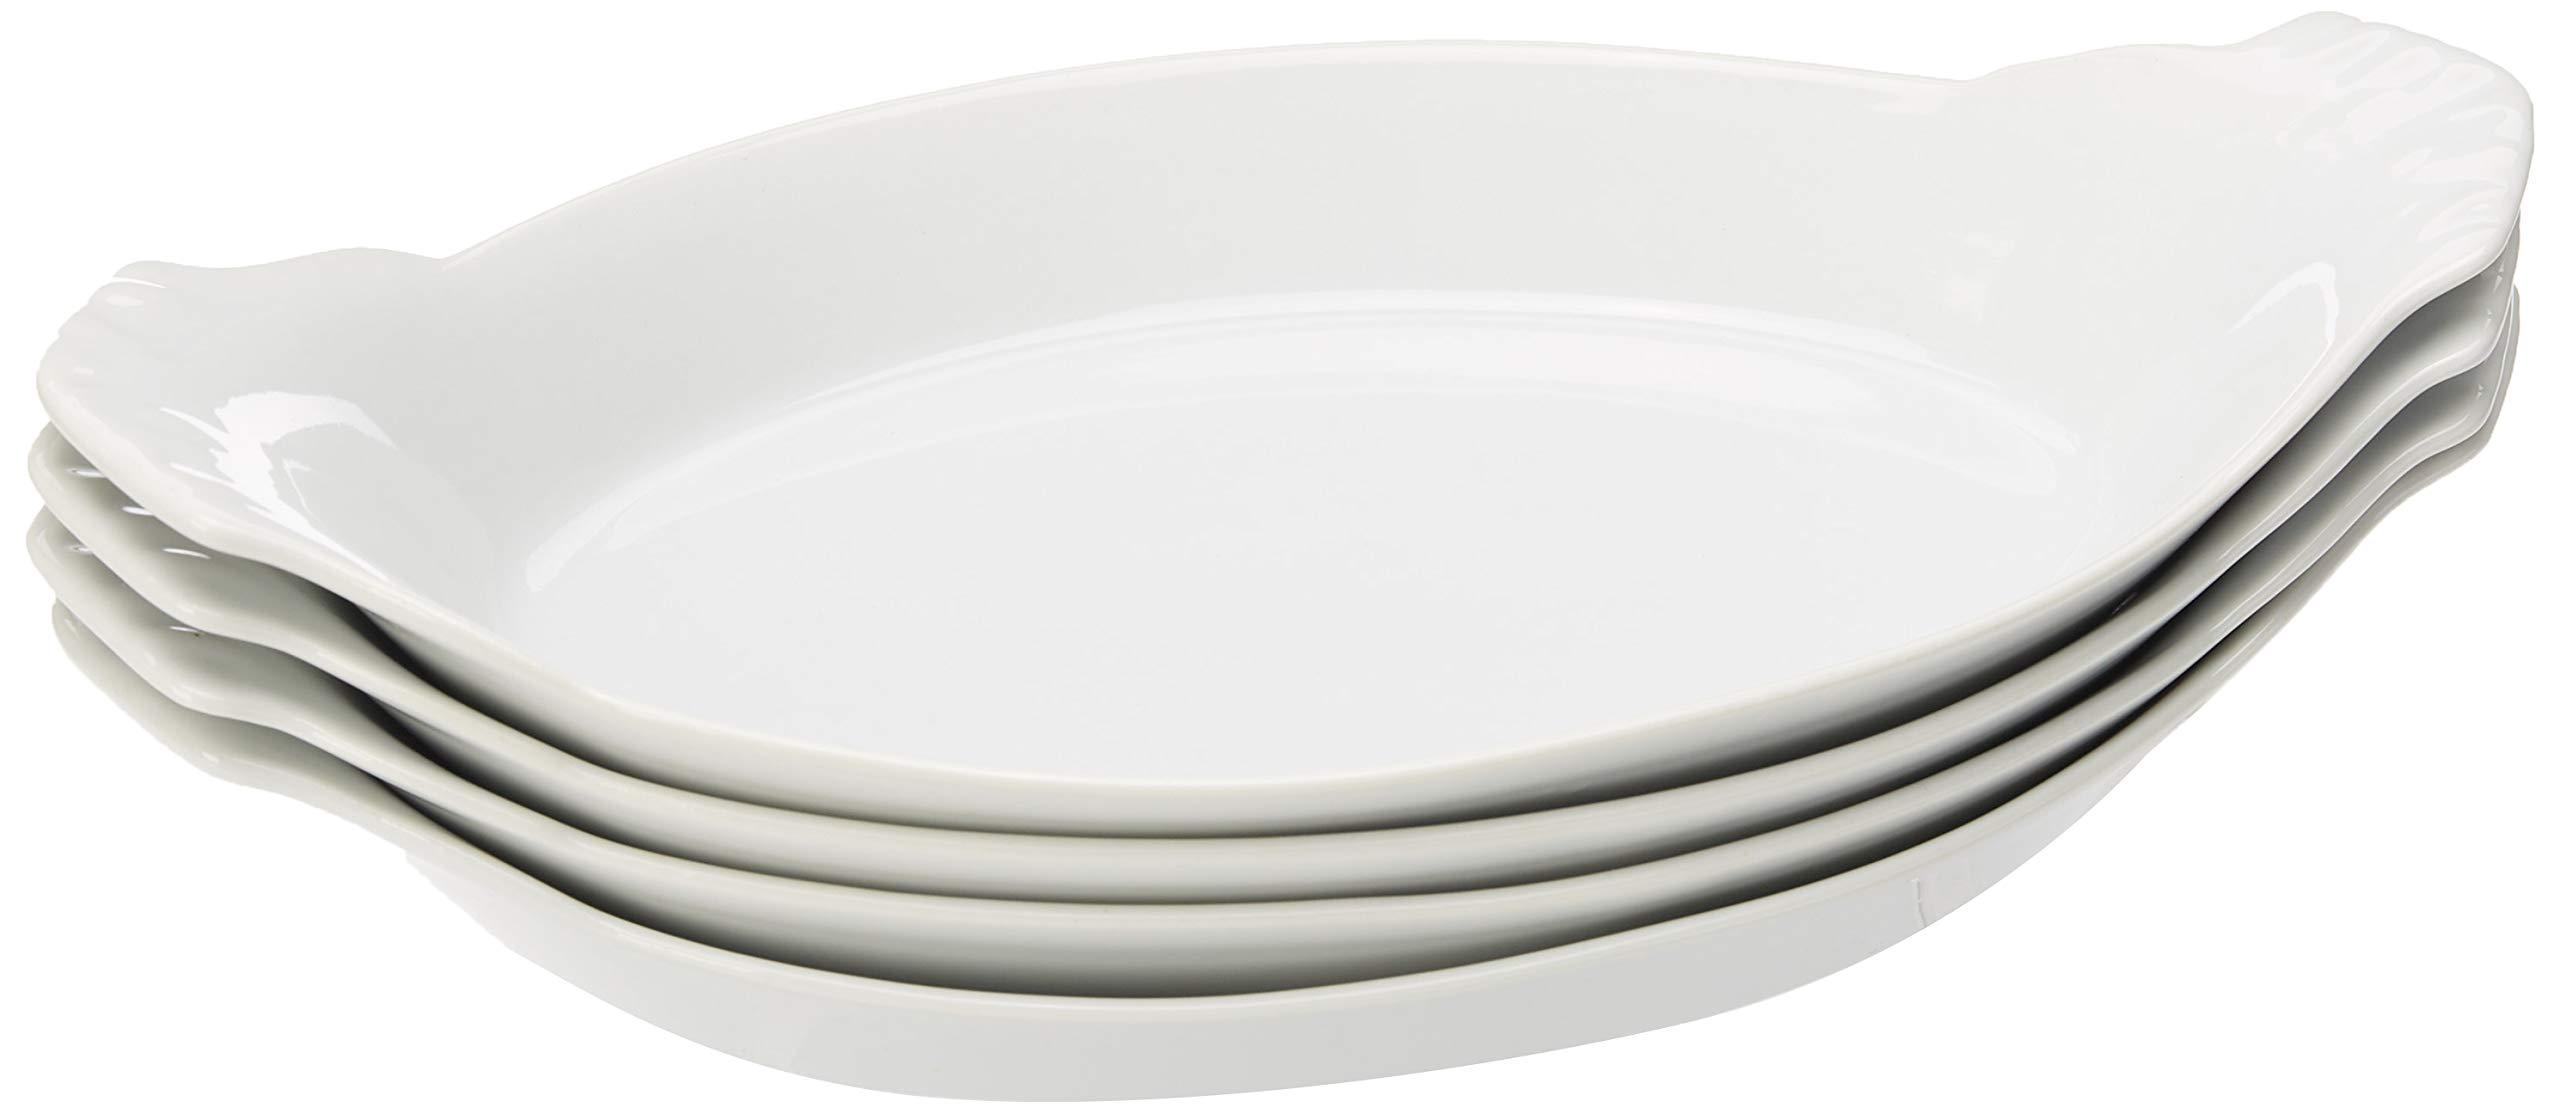 HIC Oval Au Gratin Baking Dishes, Fine White Porcelain, 10-Inch, Set of 4